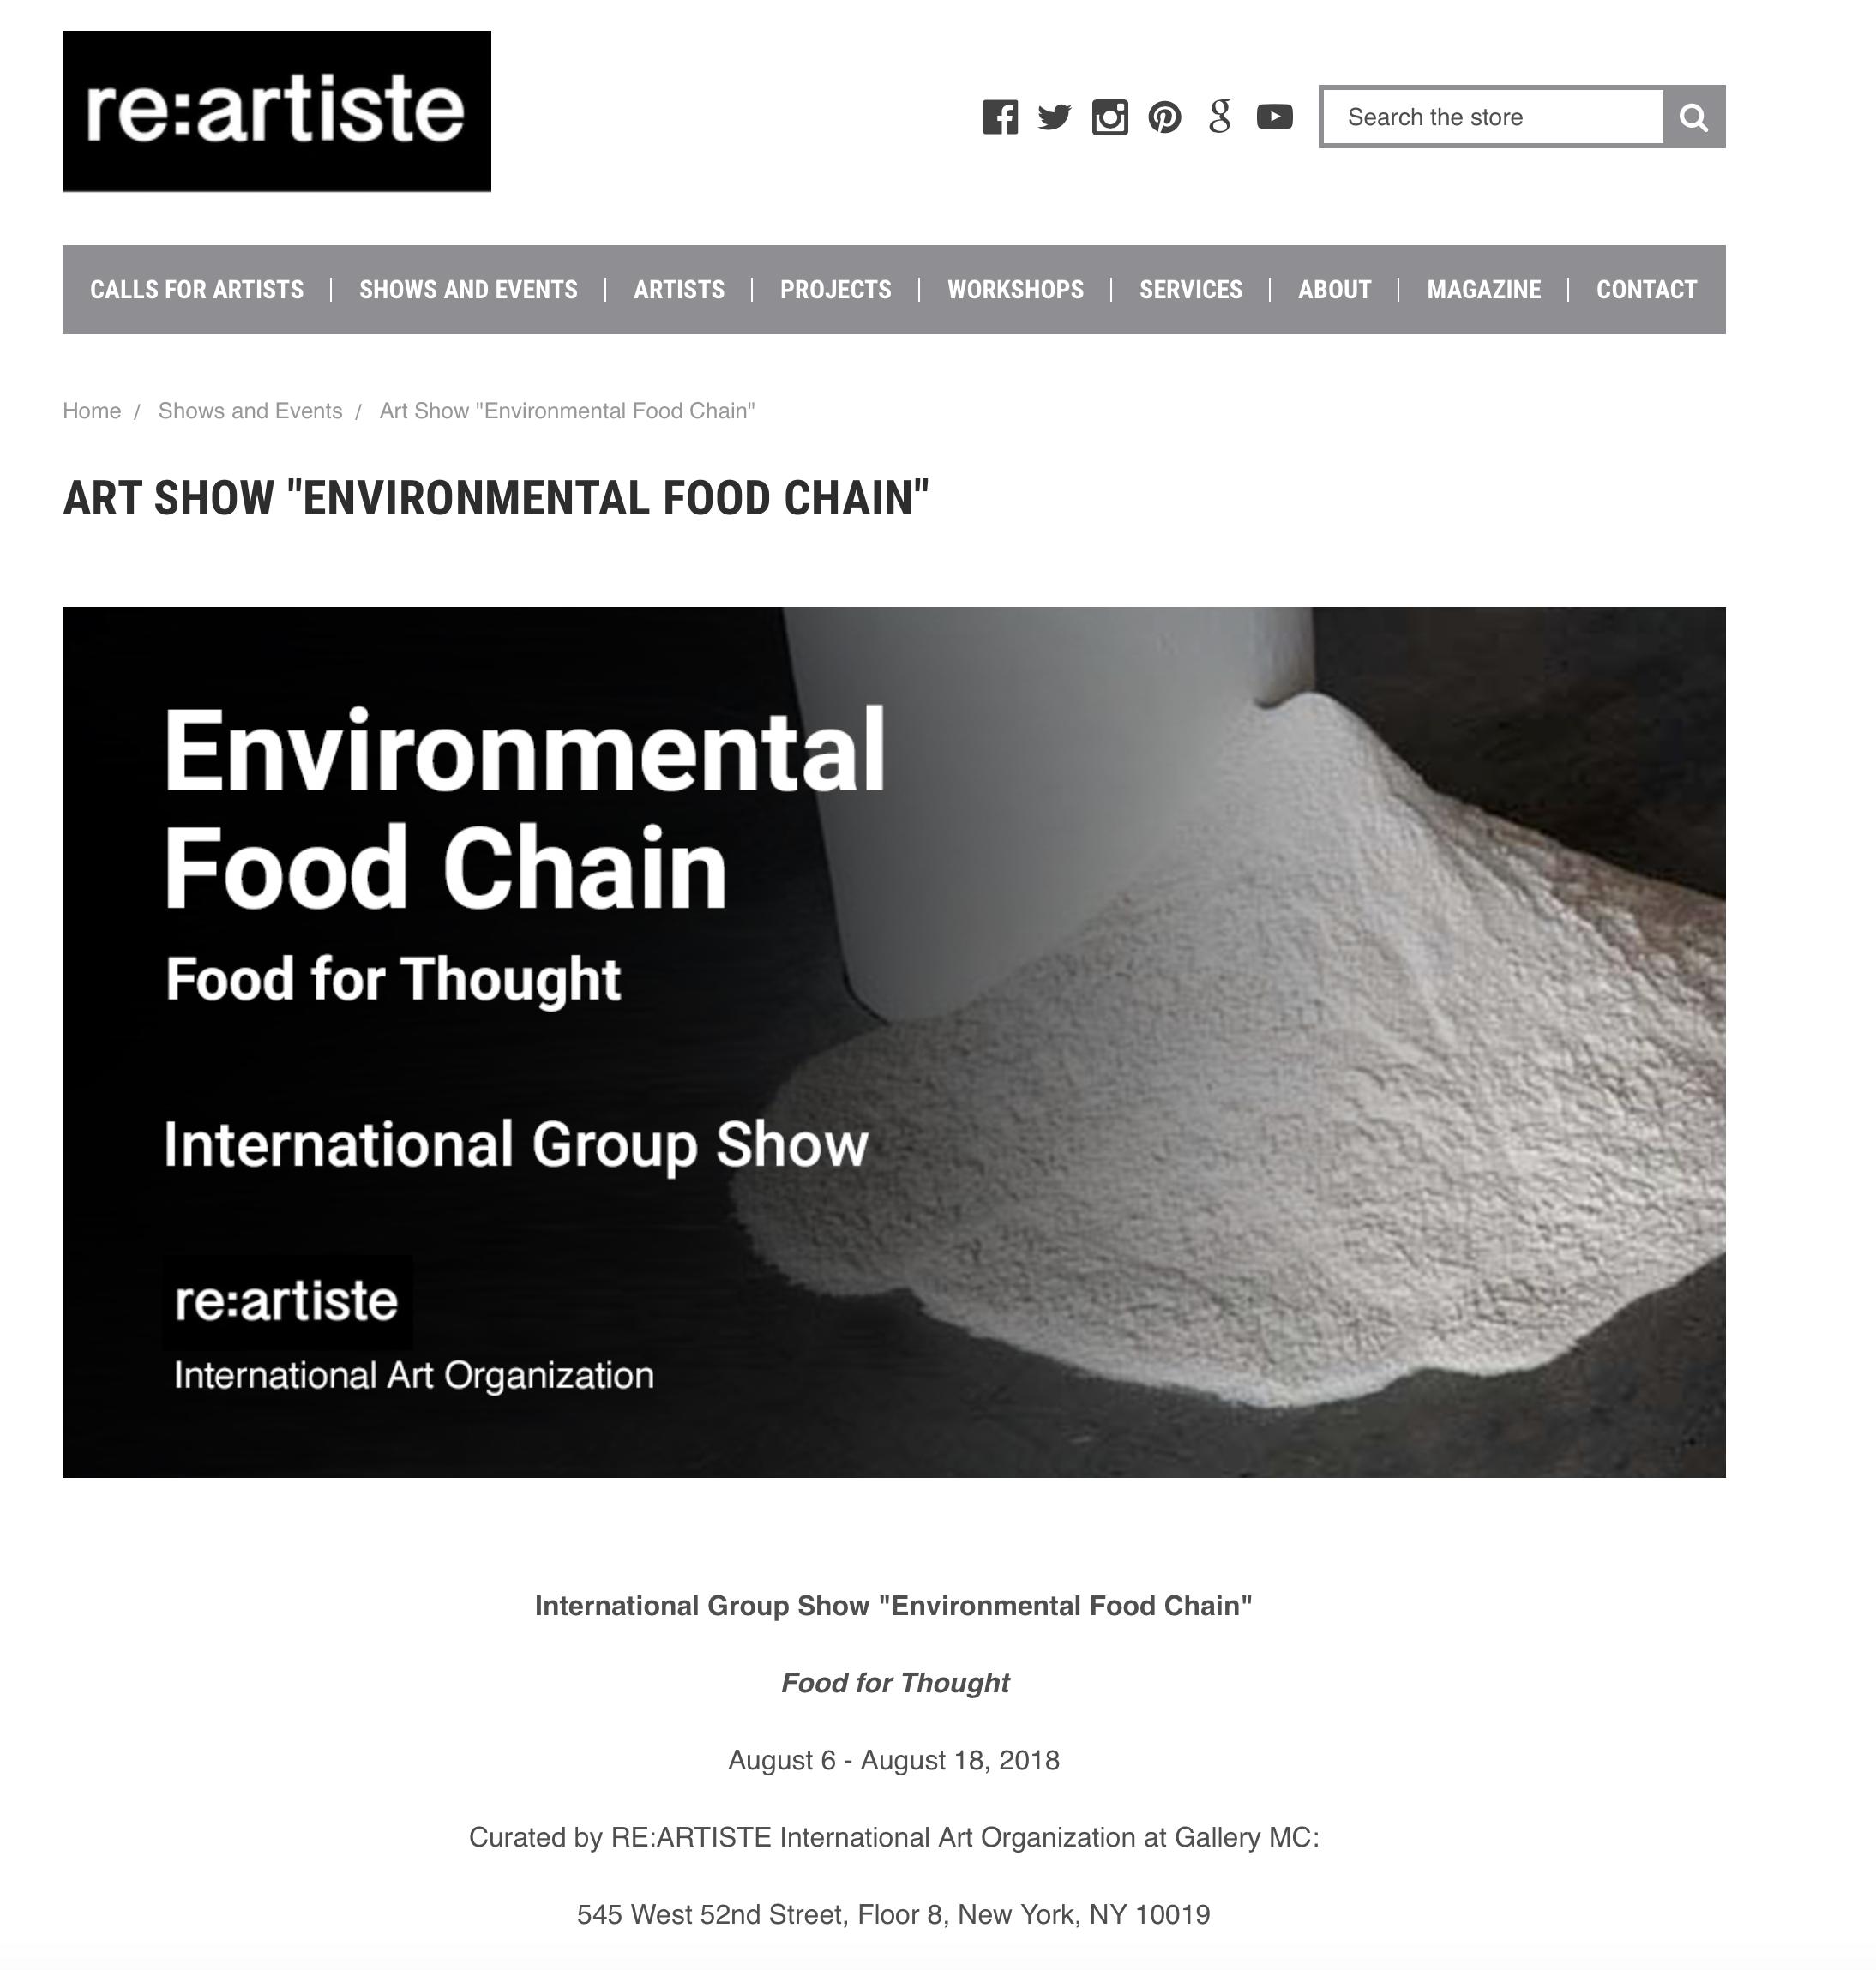 http://www.reartiste.com/art-show-environmental-food-chain/